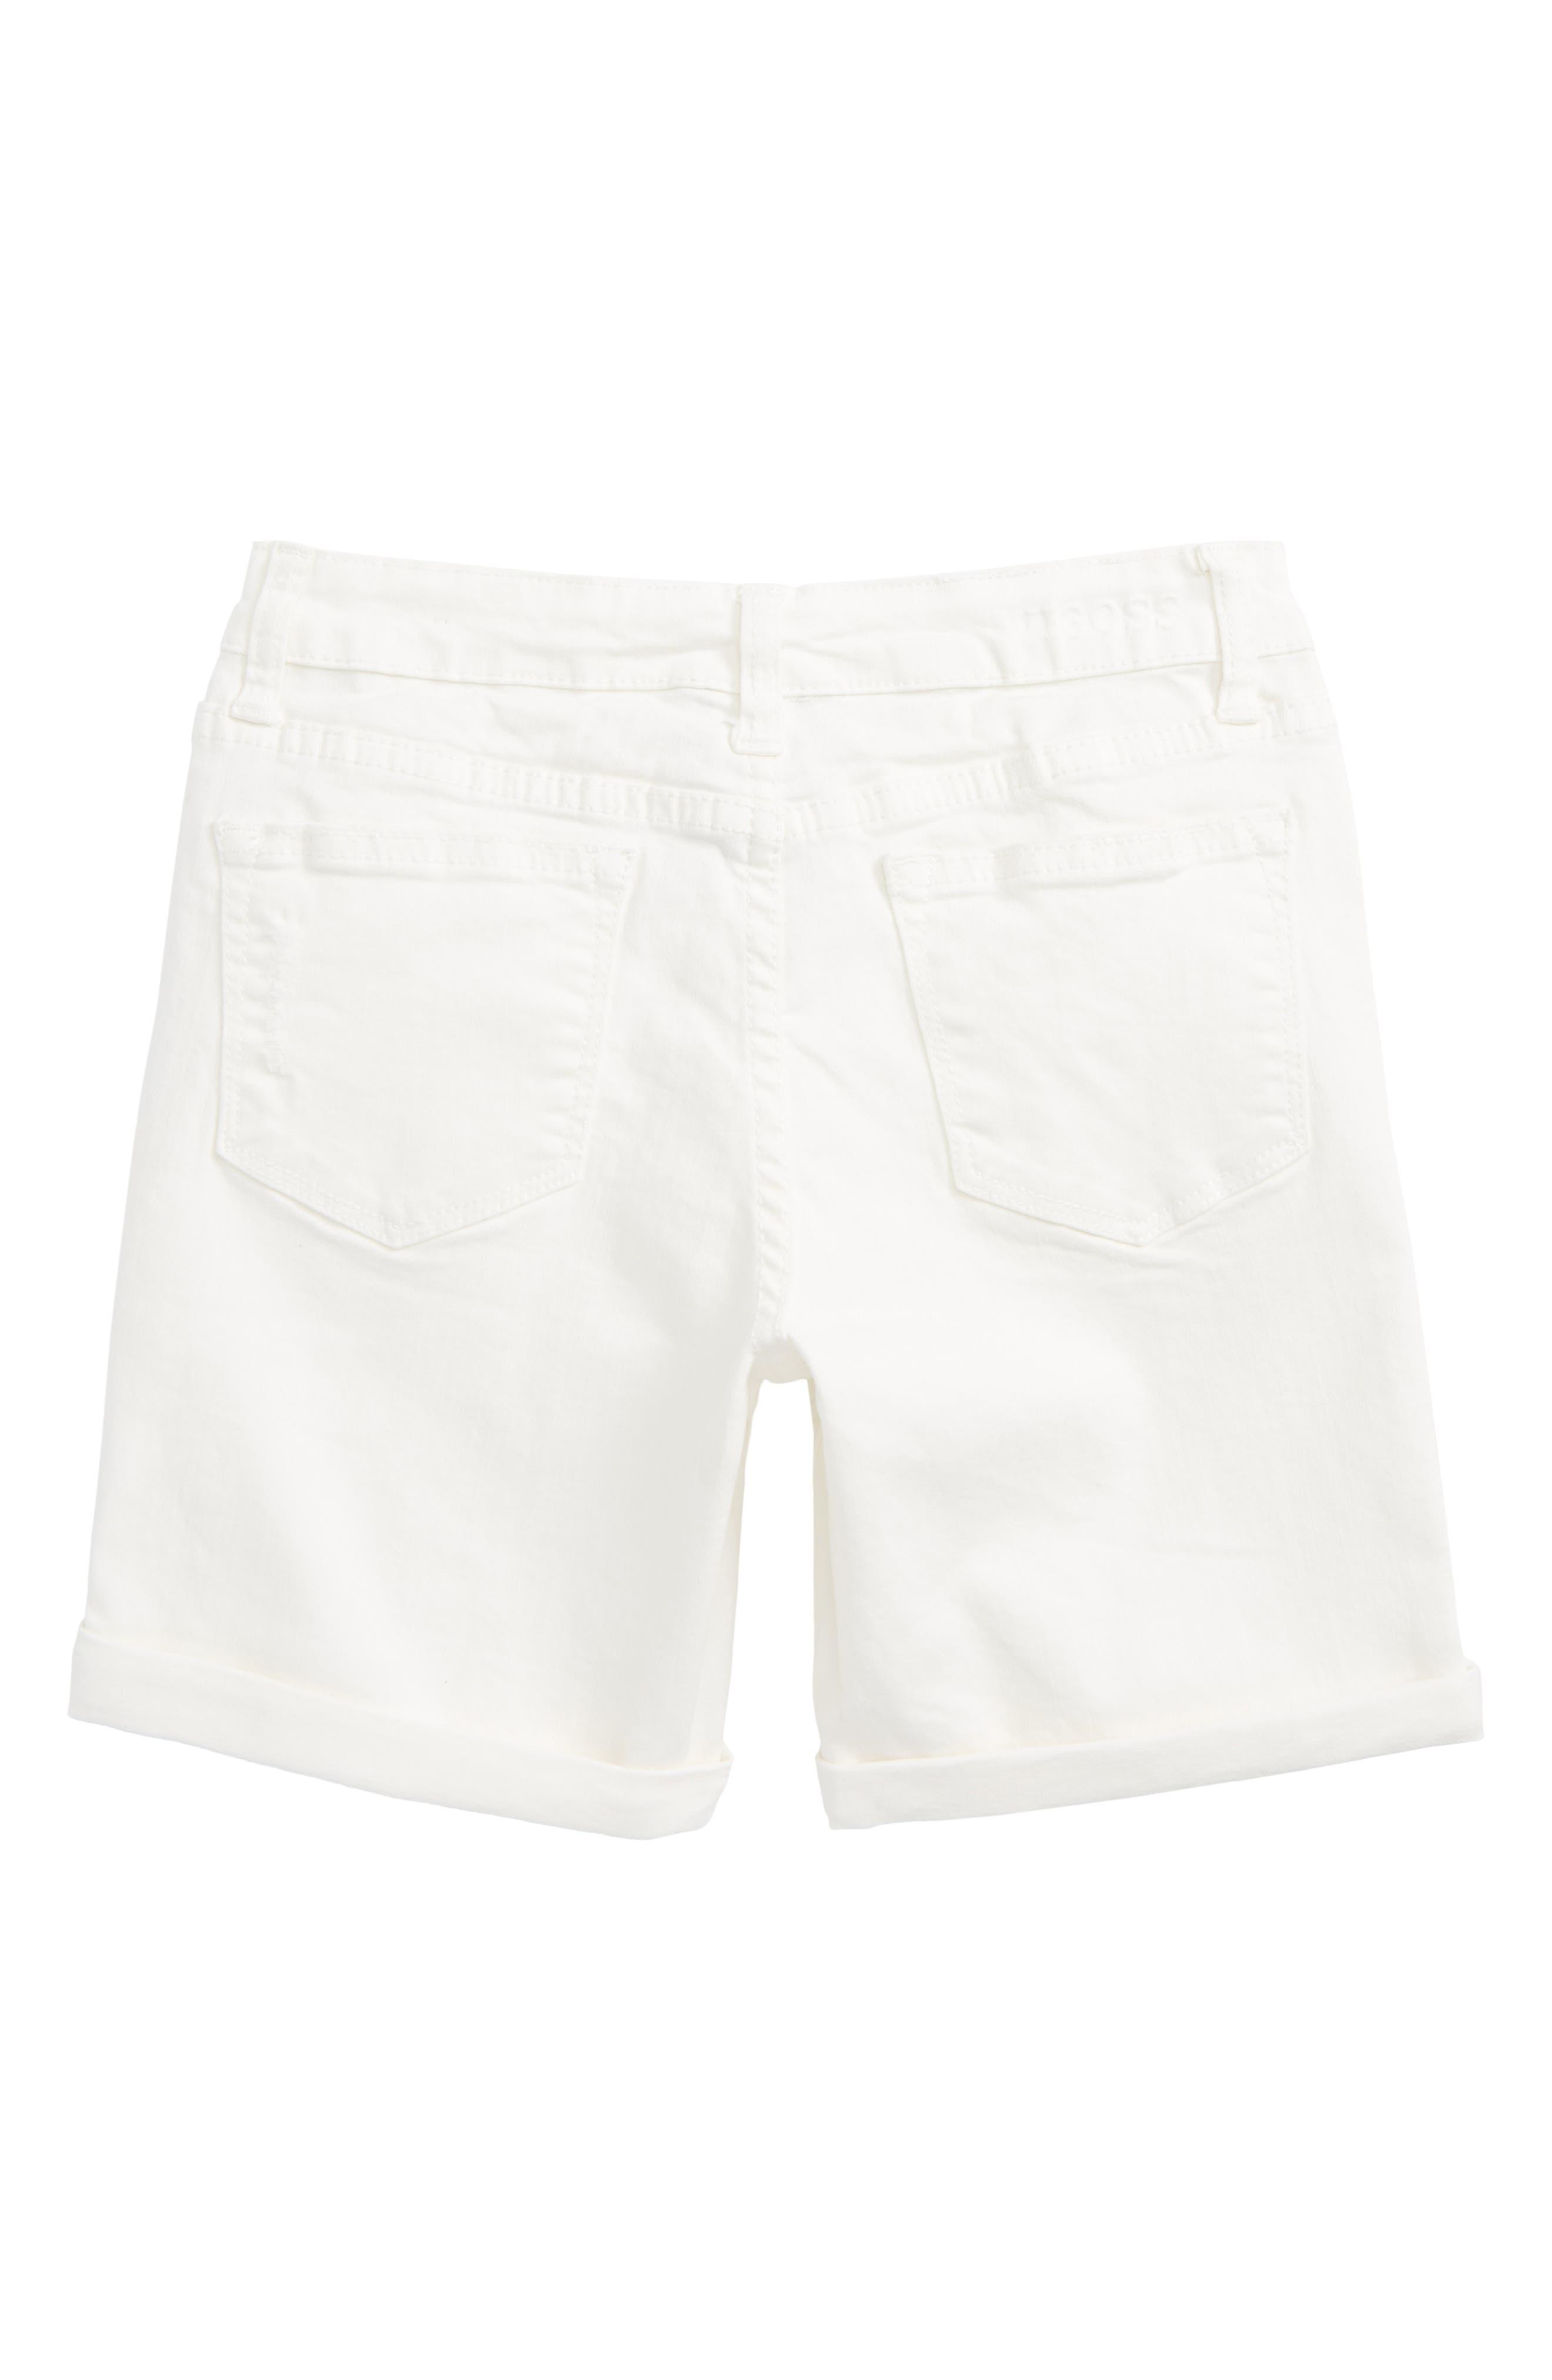 Distressed Bermuda Shorts,                             Alternate thumbnail 2, color,                             100